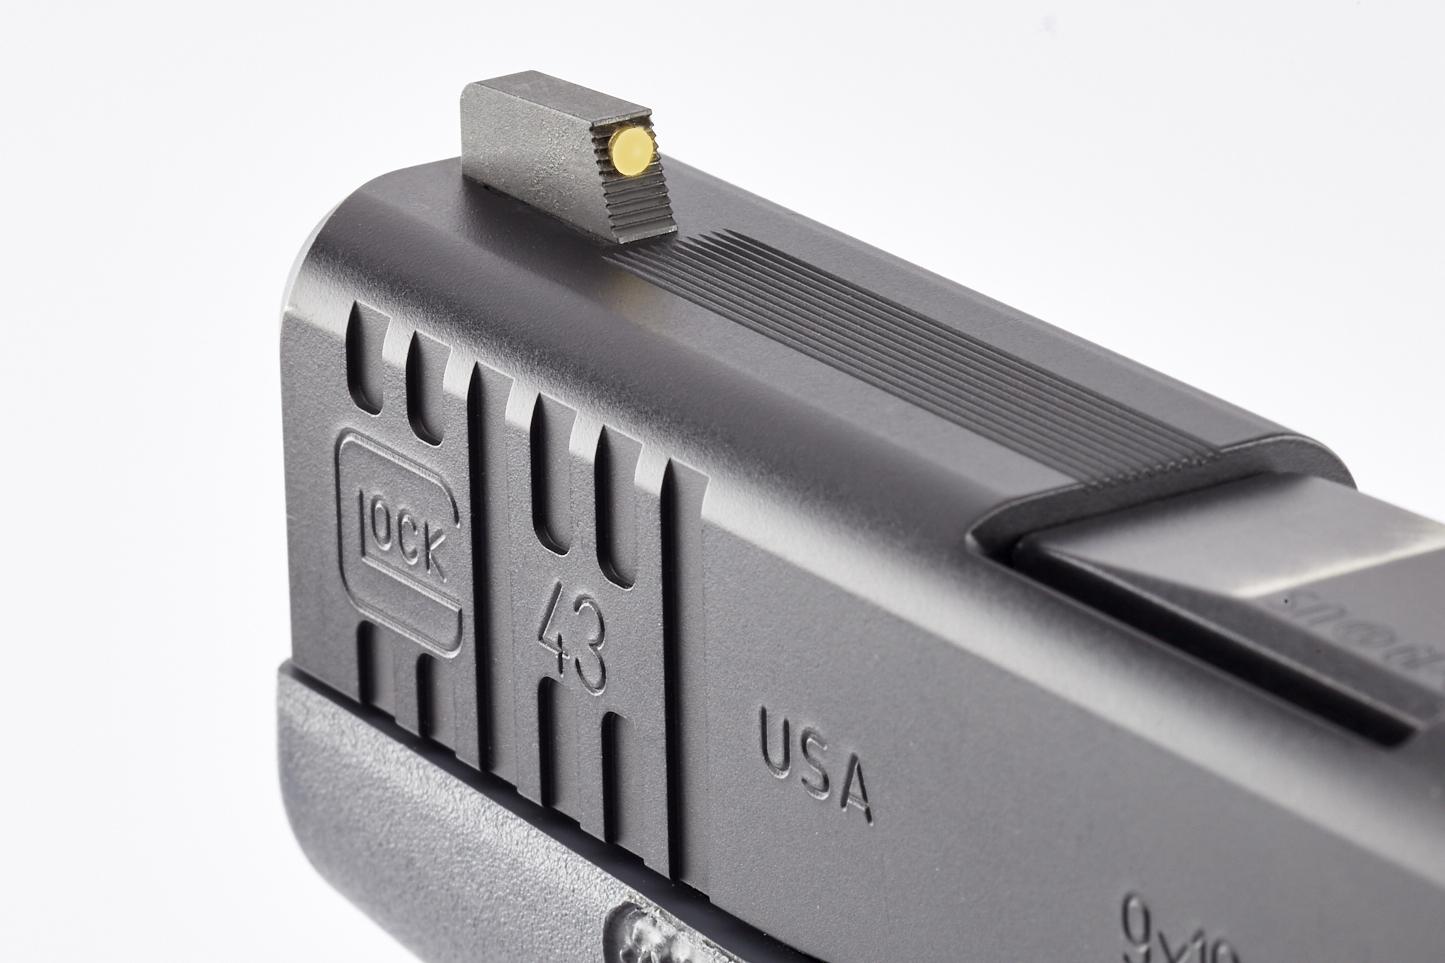 Vickers Elite Sight Set for Glock 42/43 | Black Rear | Gold